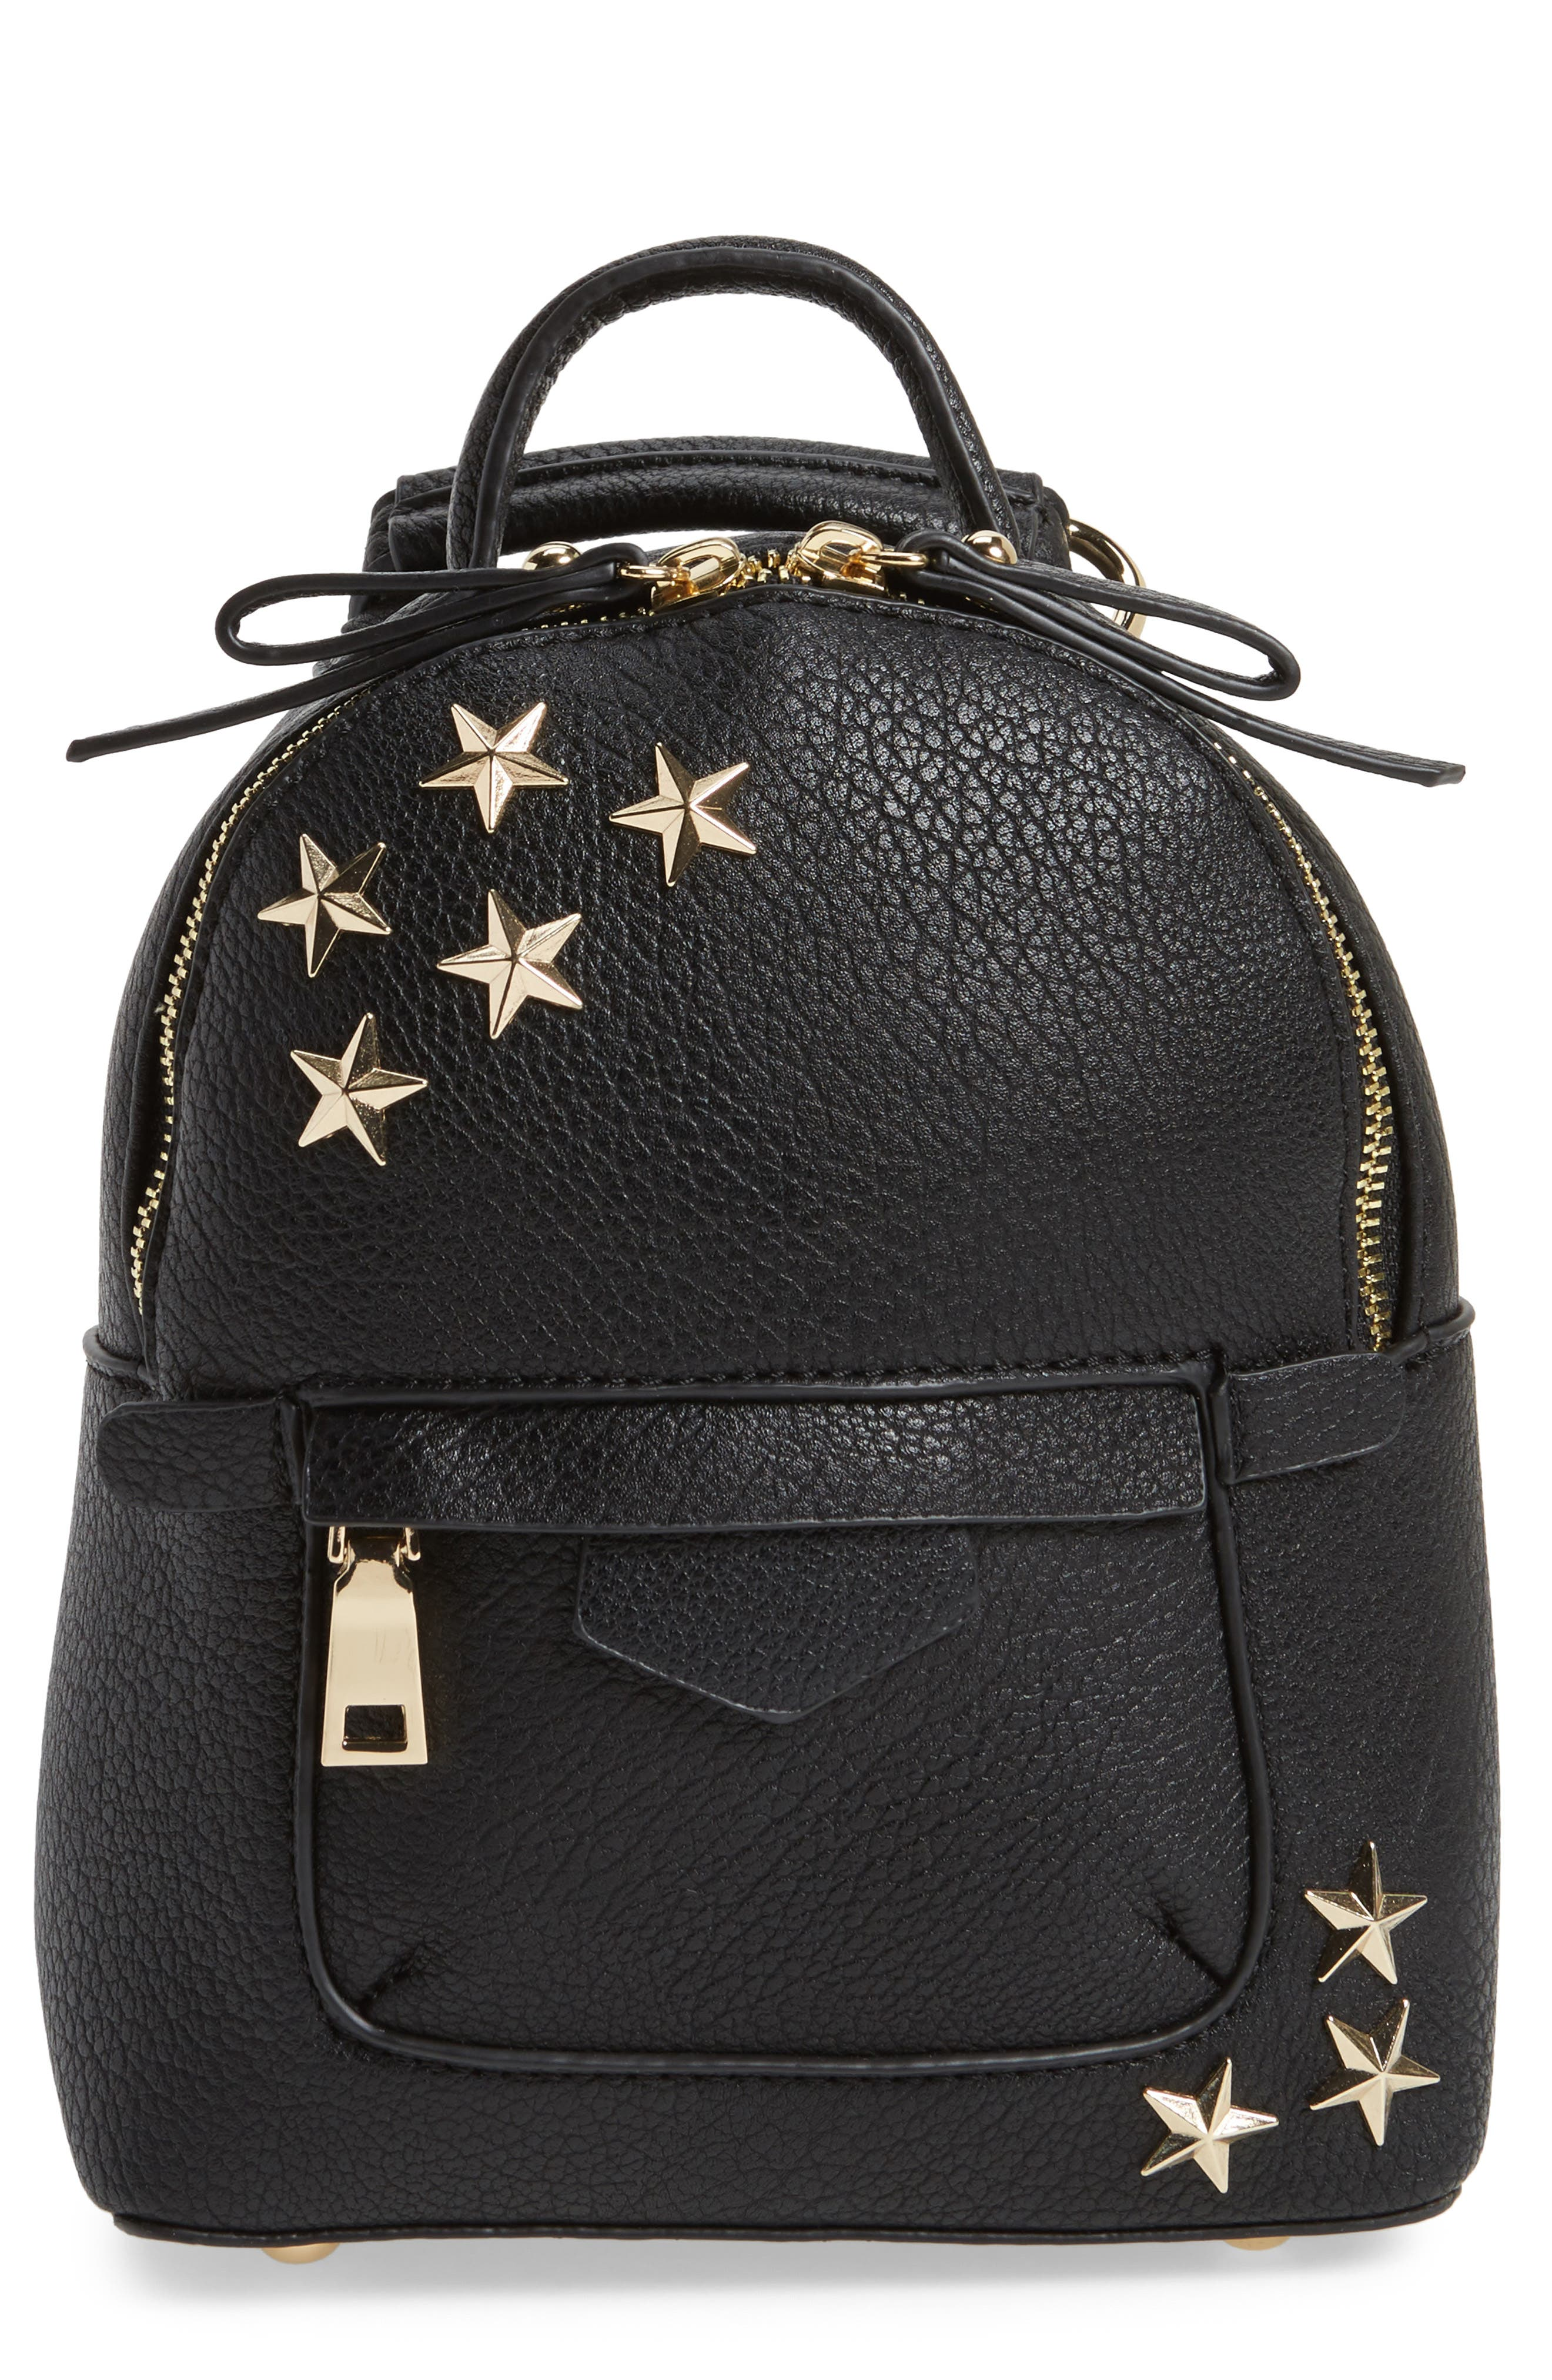 BP. Mini Star Stud Faux Leather Backpack